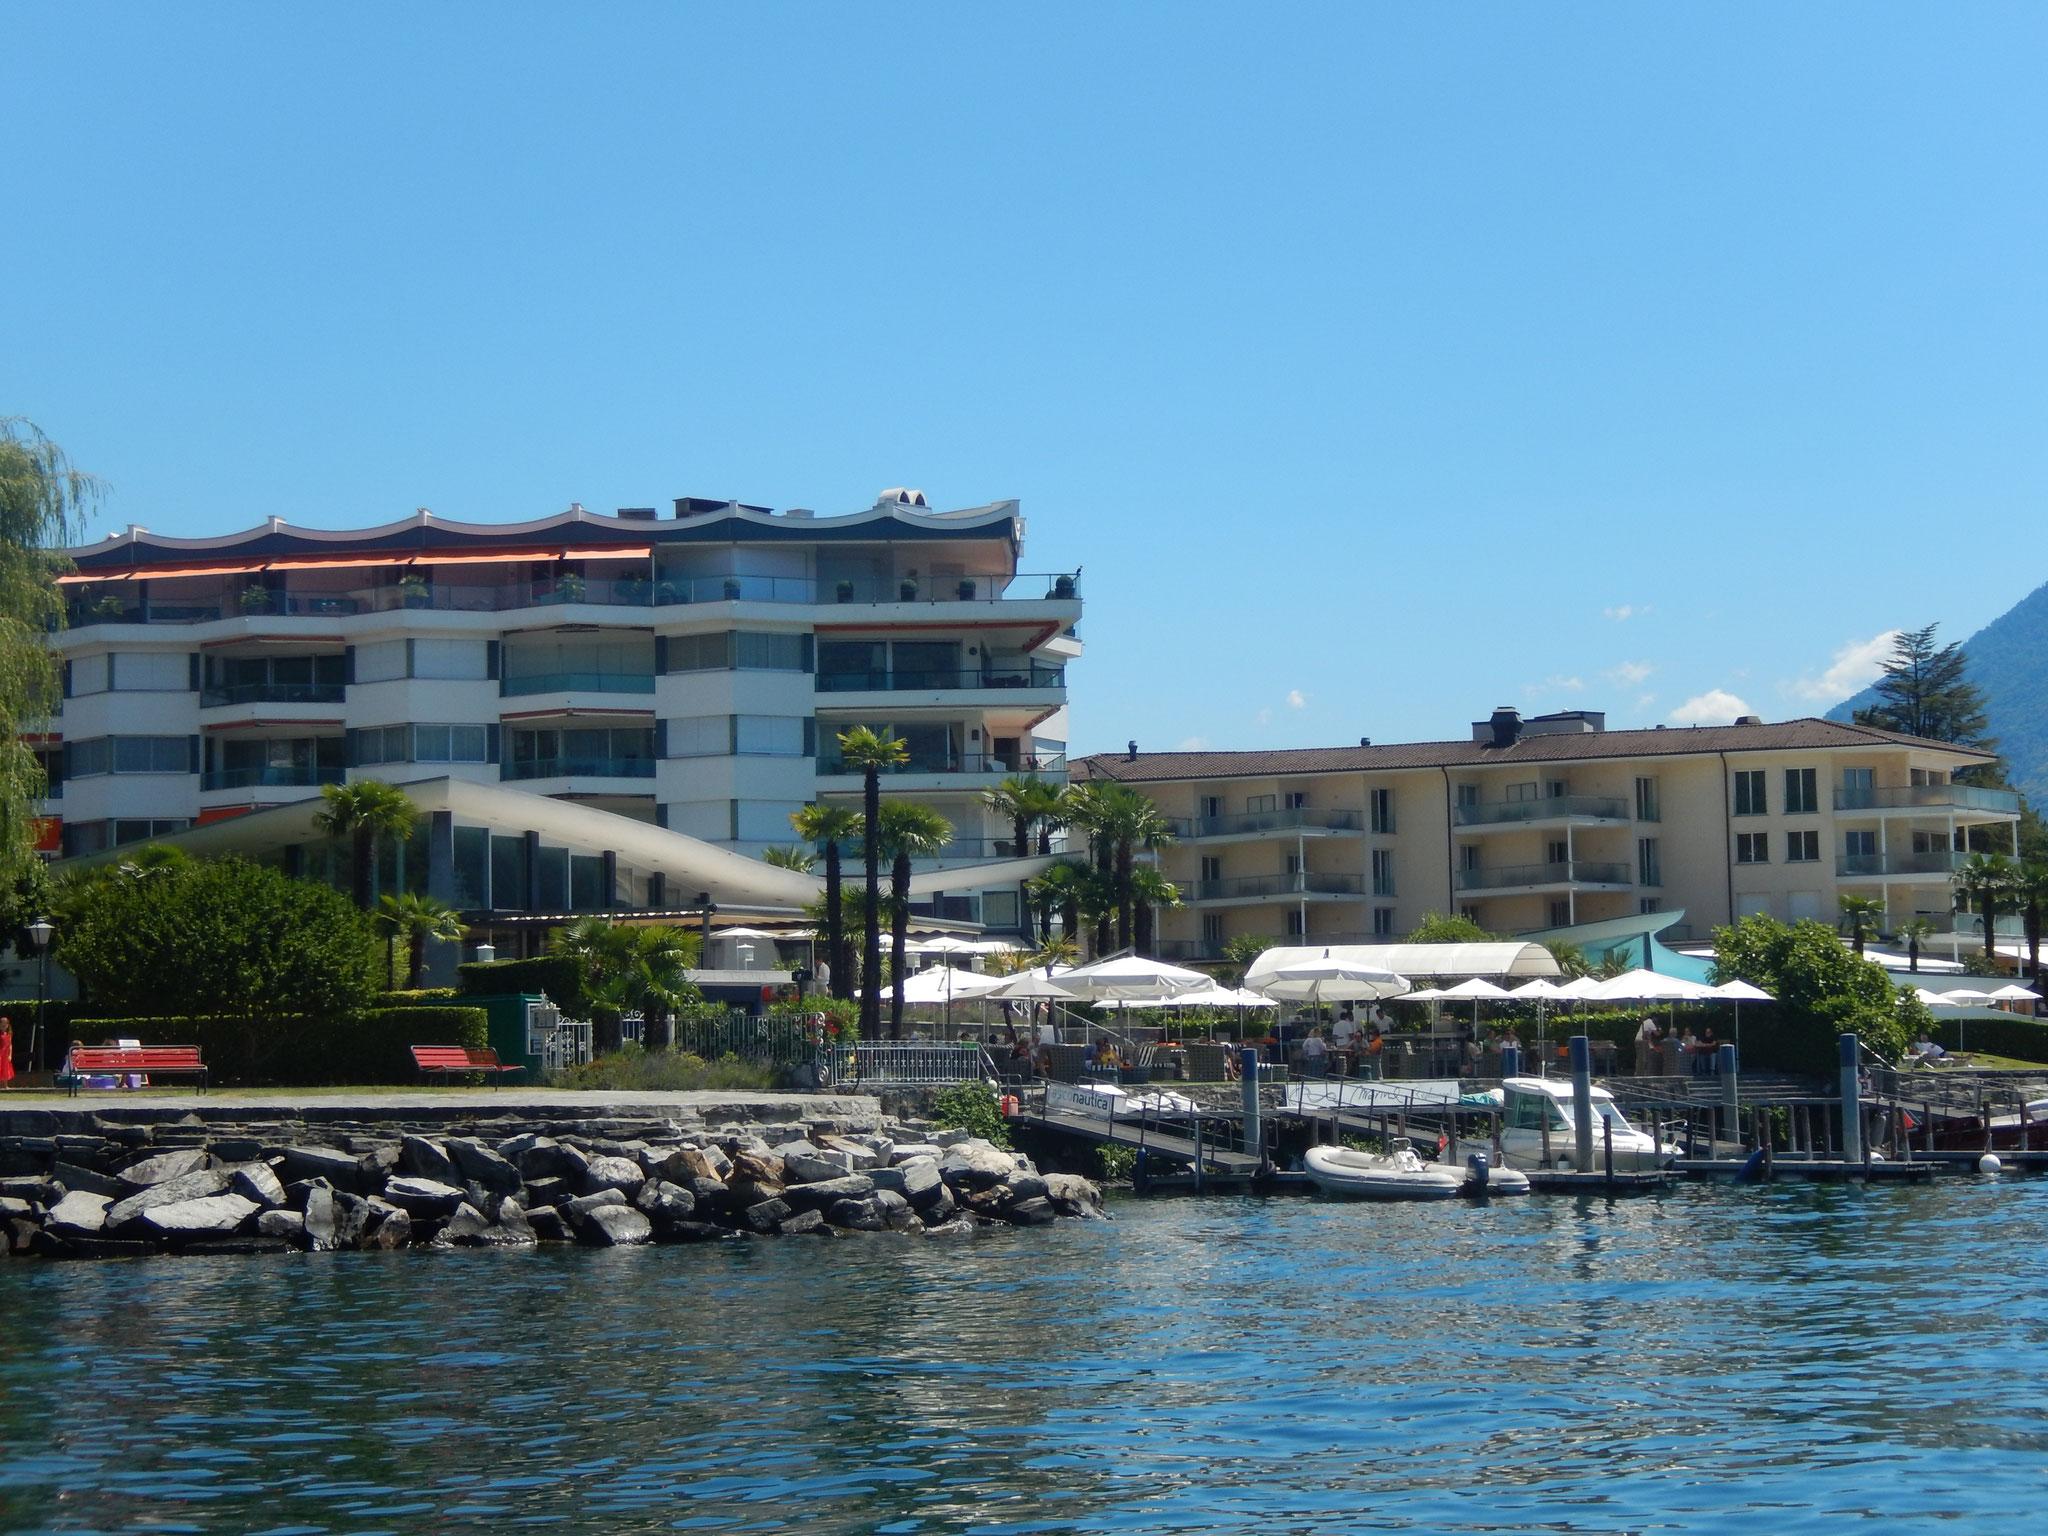 Ristorante Marina Ascona